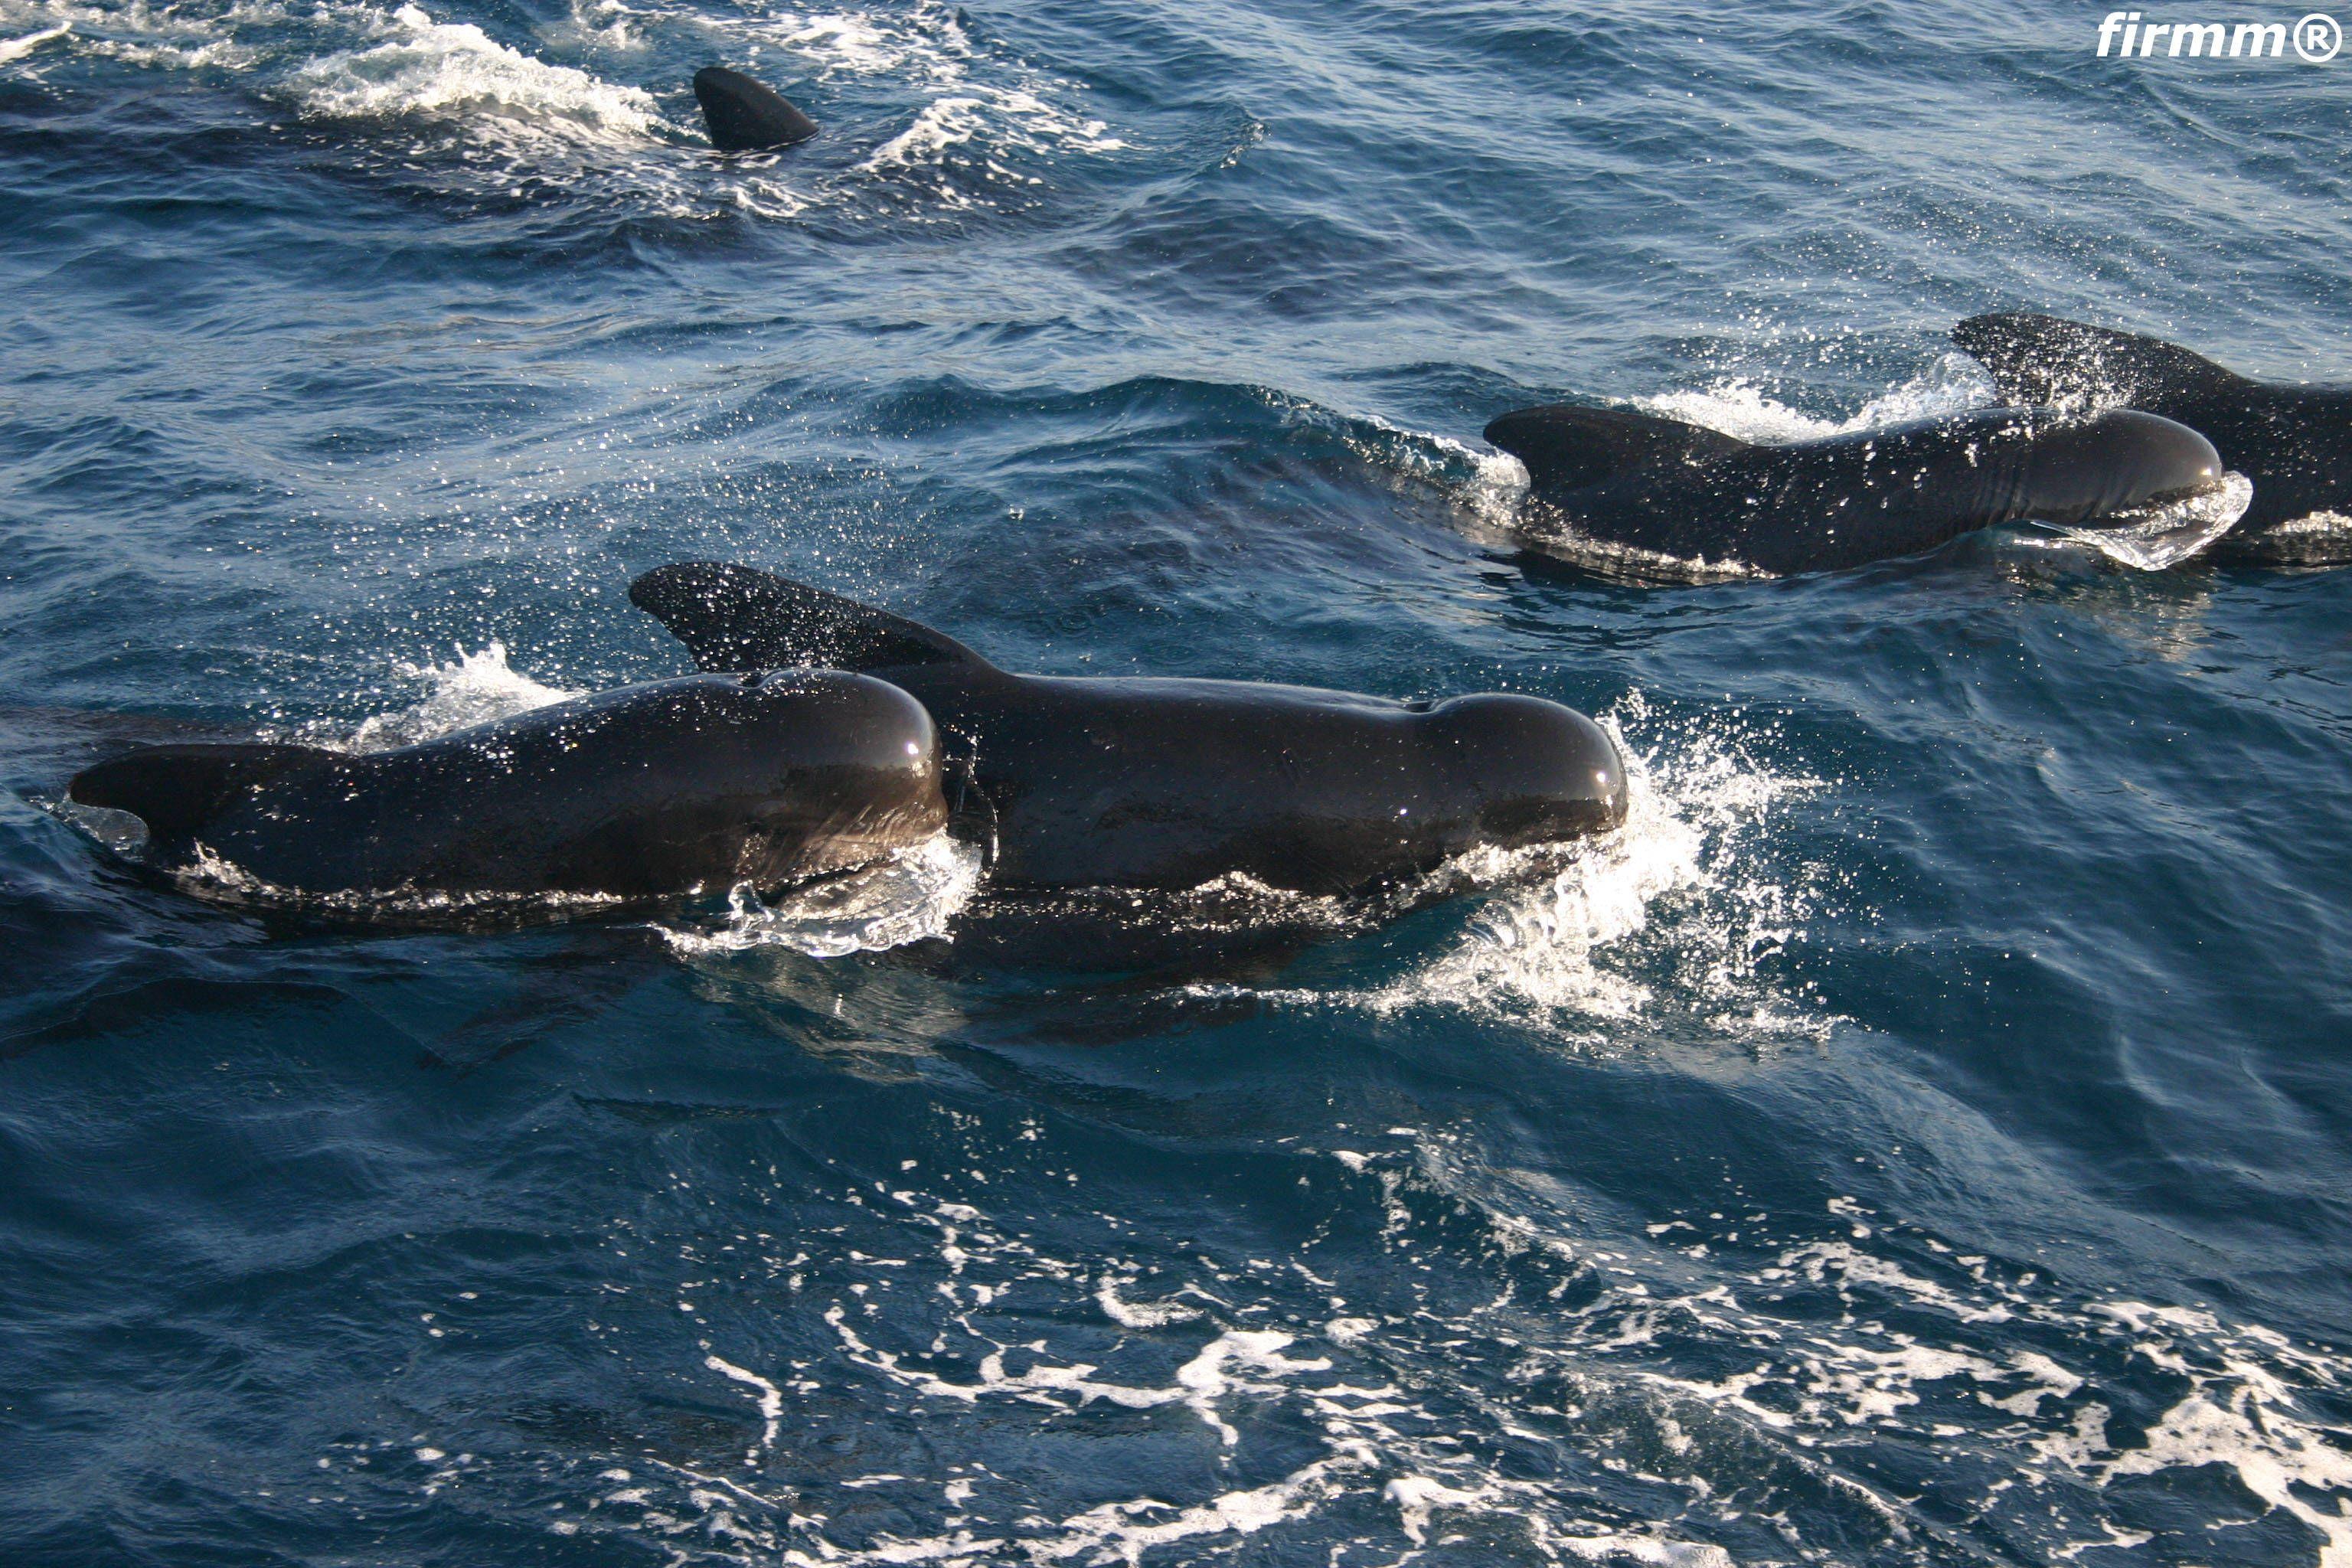 http://www.bangngangan.com/images/whales-dolphins-tarifa_1173202.jpg